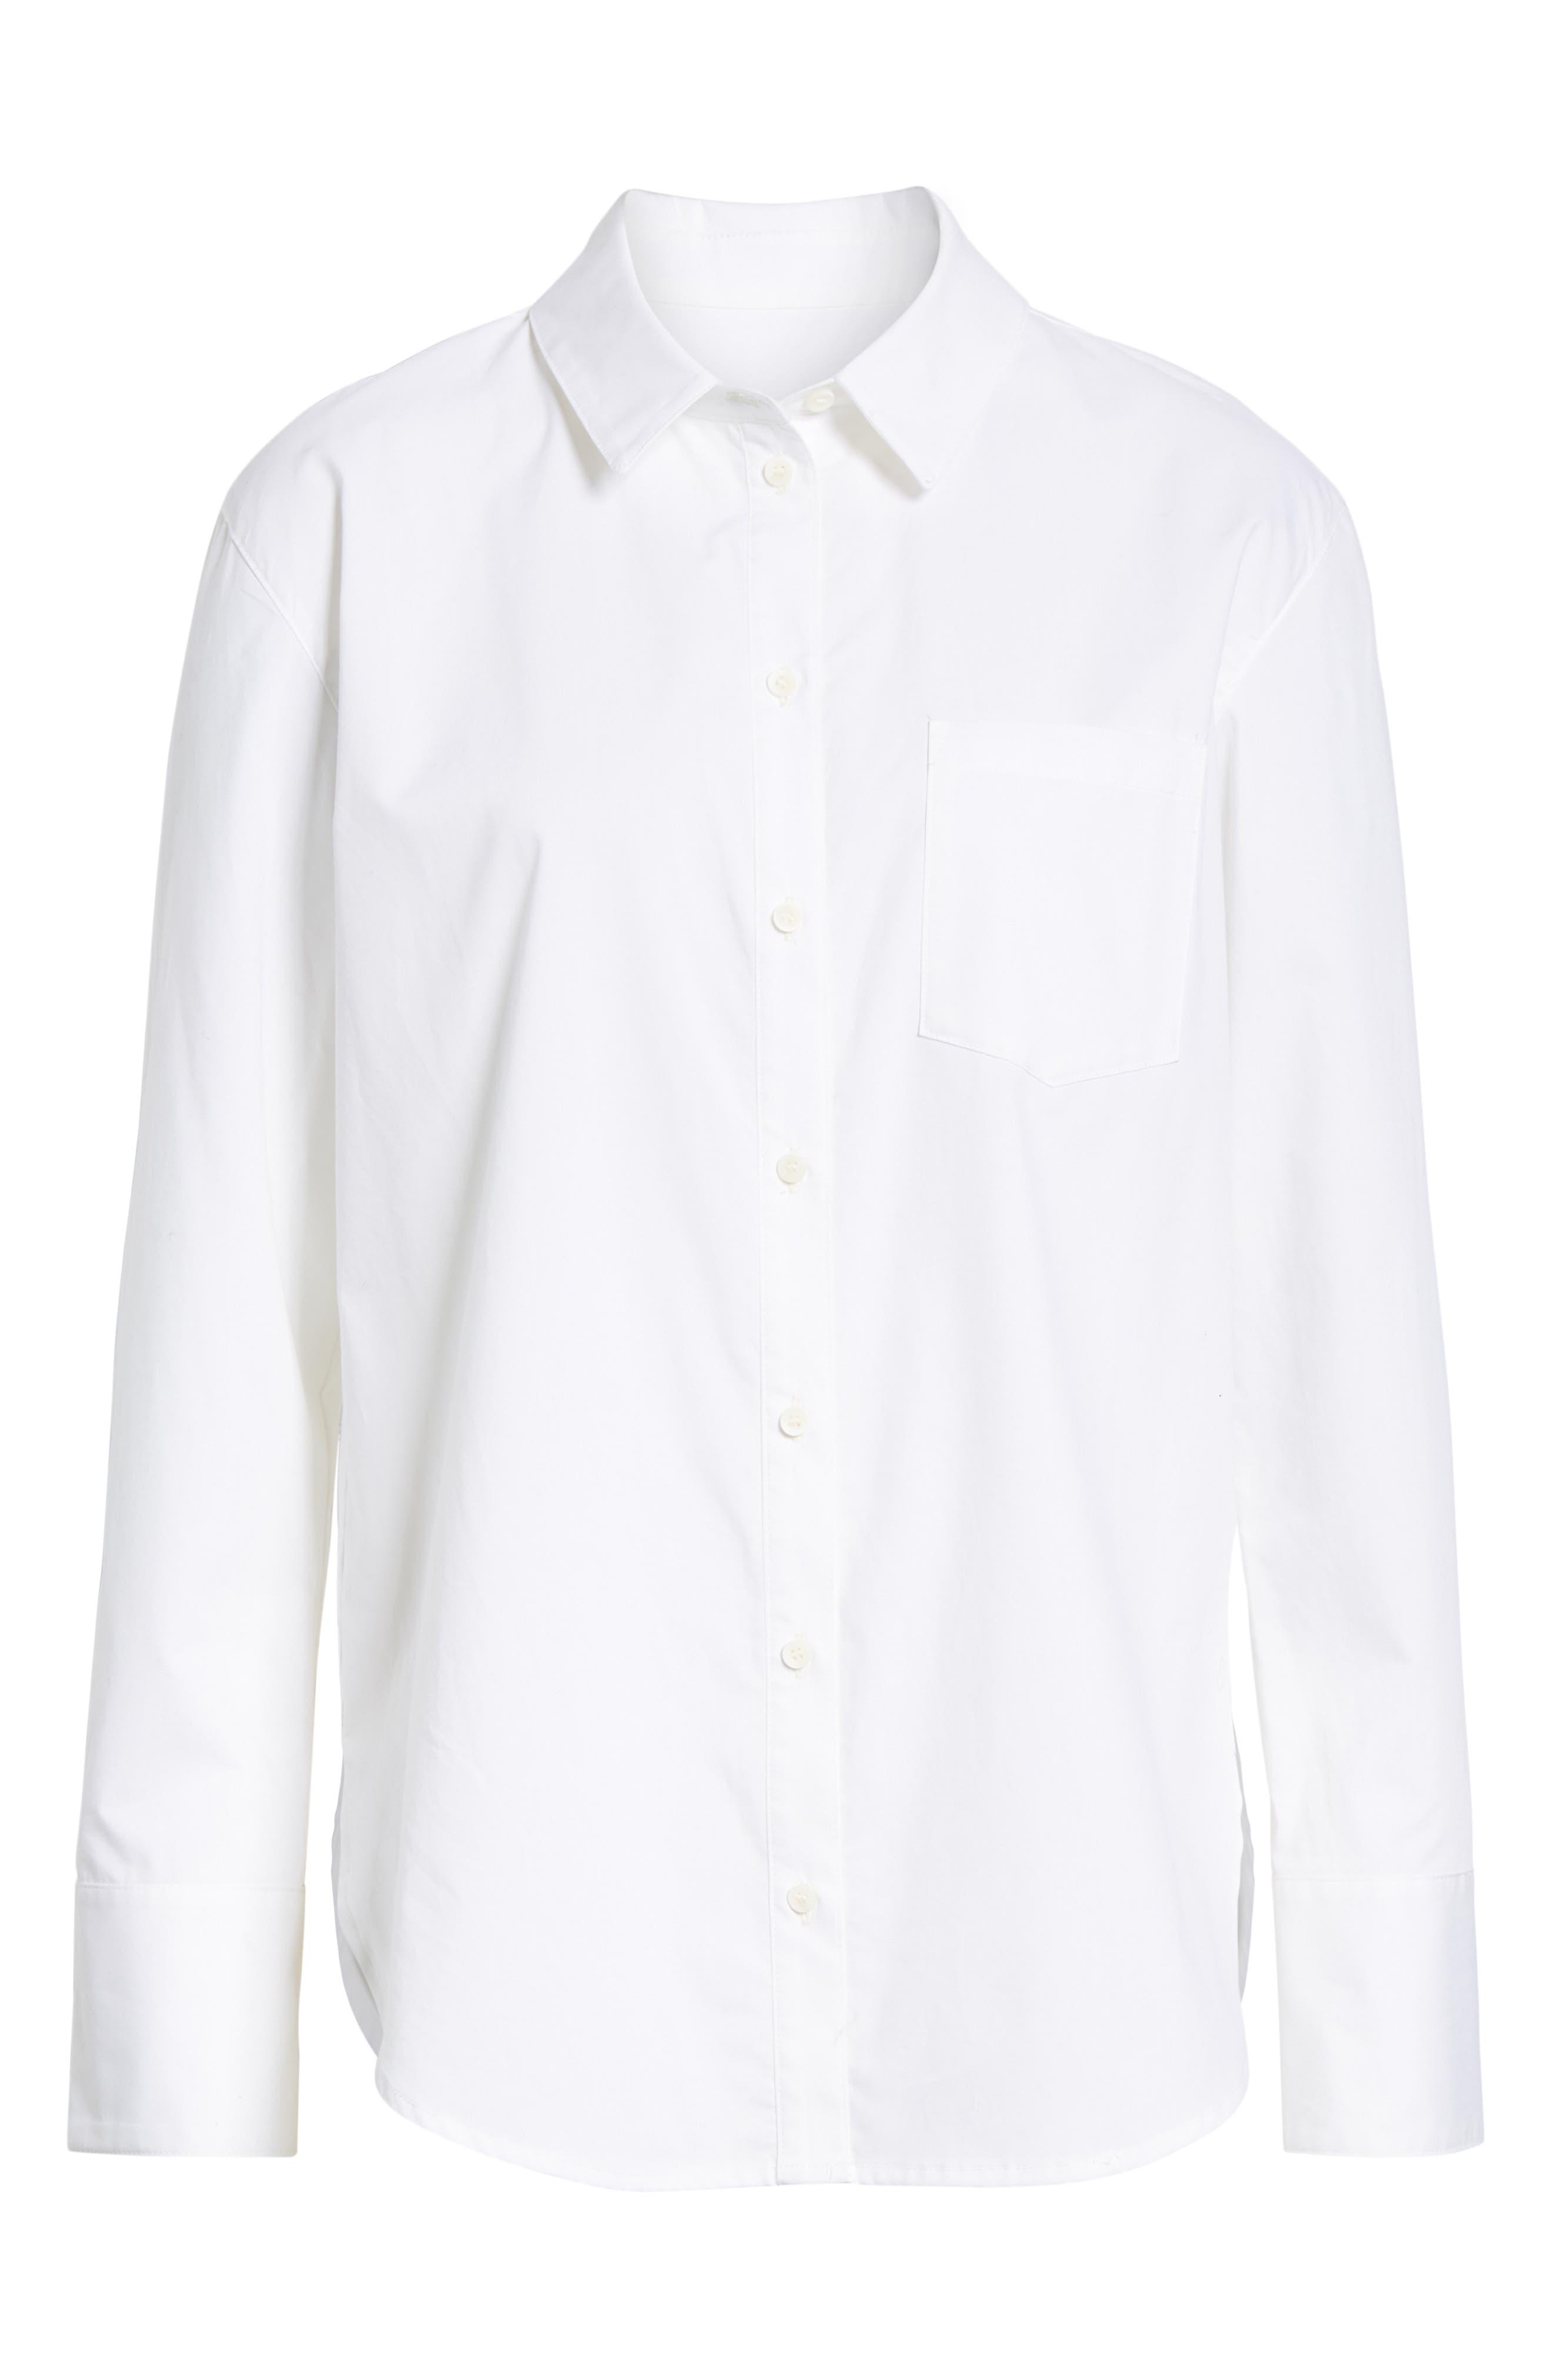 Boyfriend Oxford Shirt,                             Alternate thumbnail 6, color,                             100